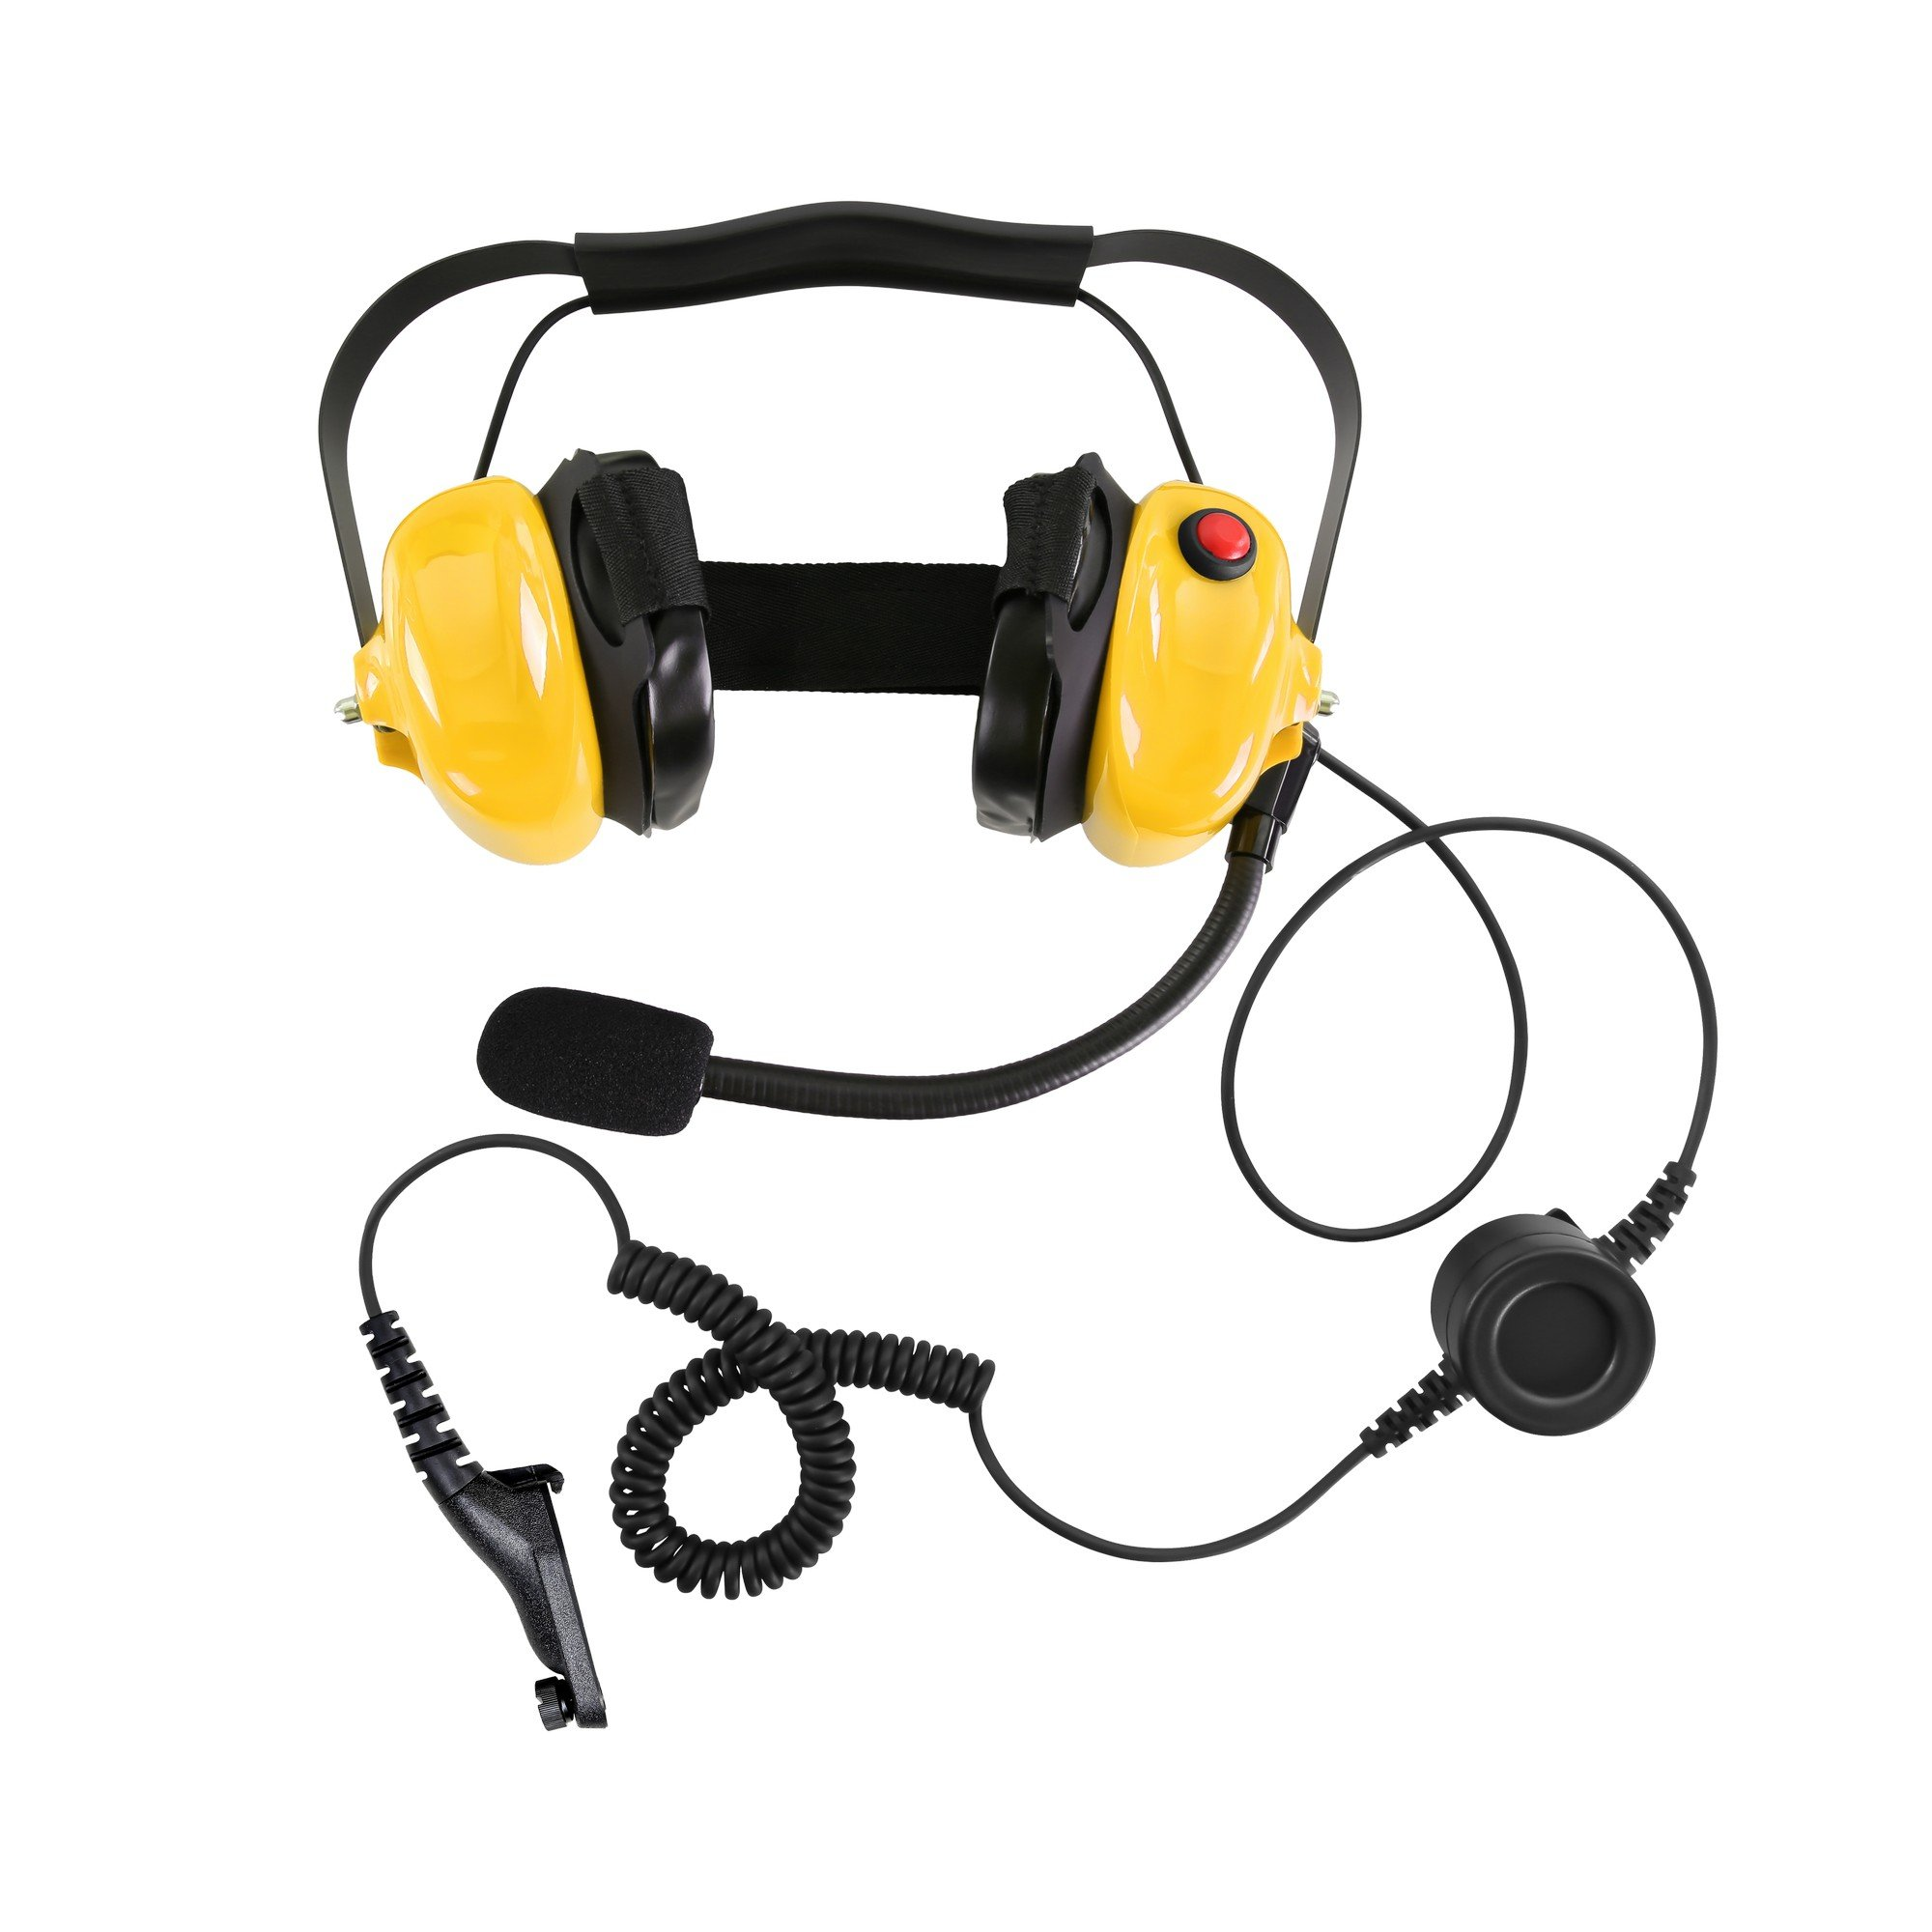 Bommeow BHDH50-YW-M9 Noise Isolating Headphone for Motorola Mototrbo DP4800 DP4601 Walkie Talkies in Yellow